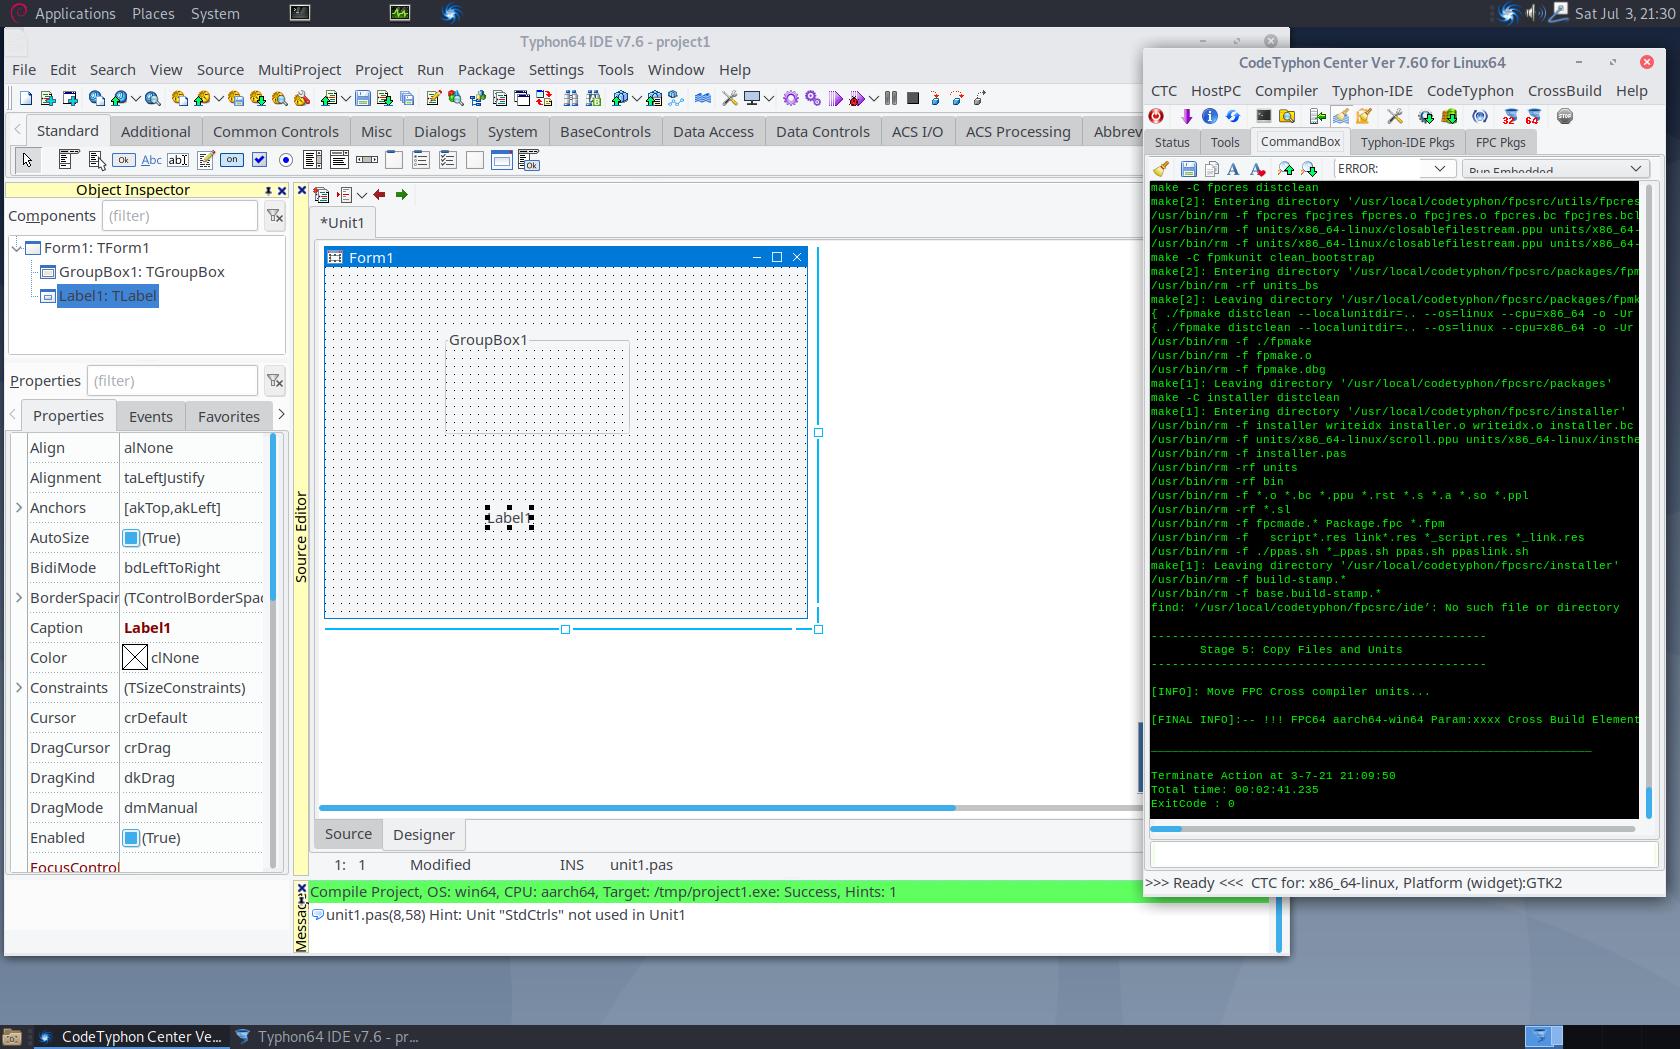 Debian62-10-2021-07-03-21-30-43.png